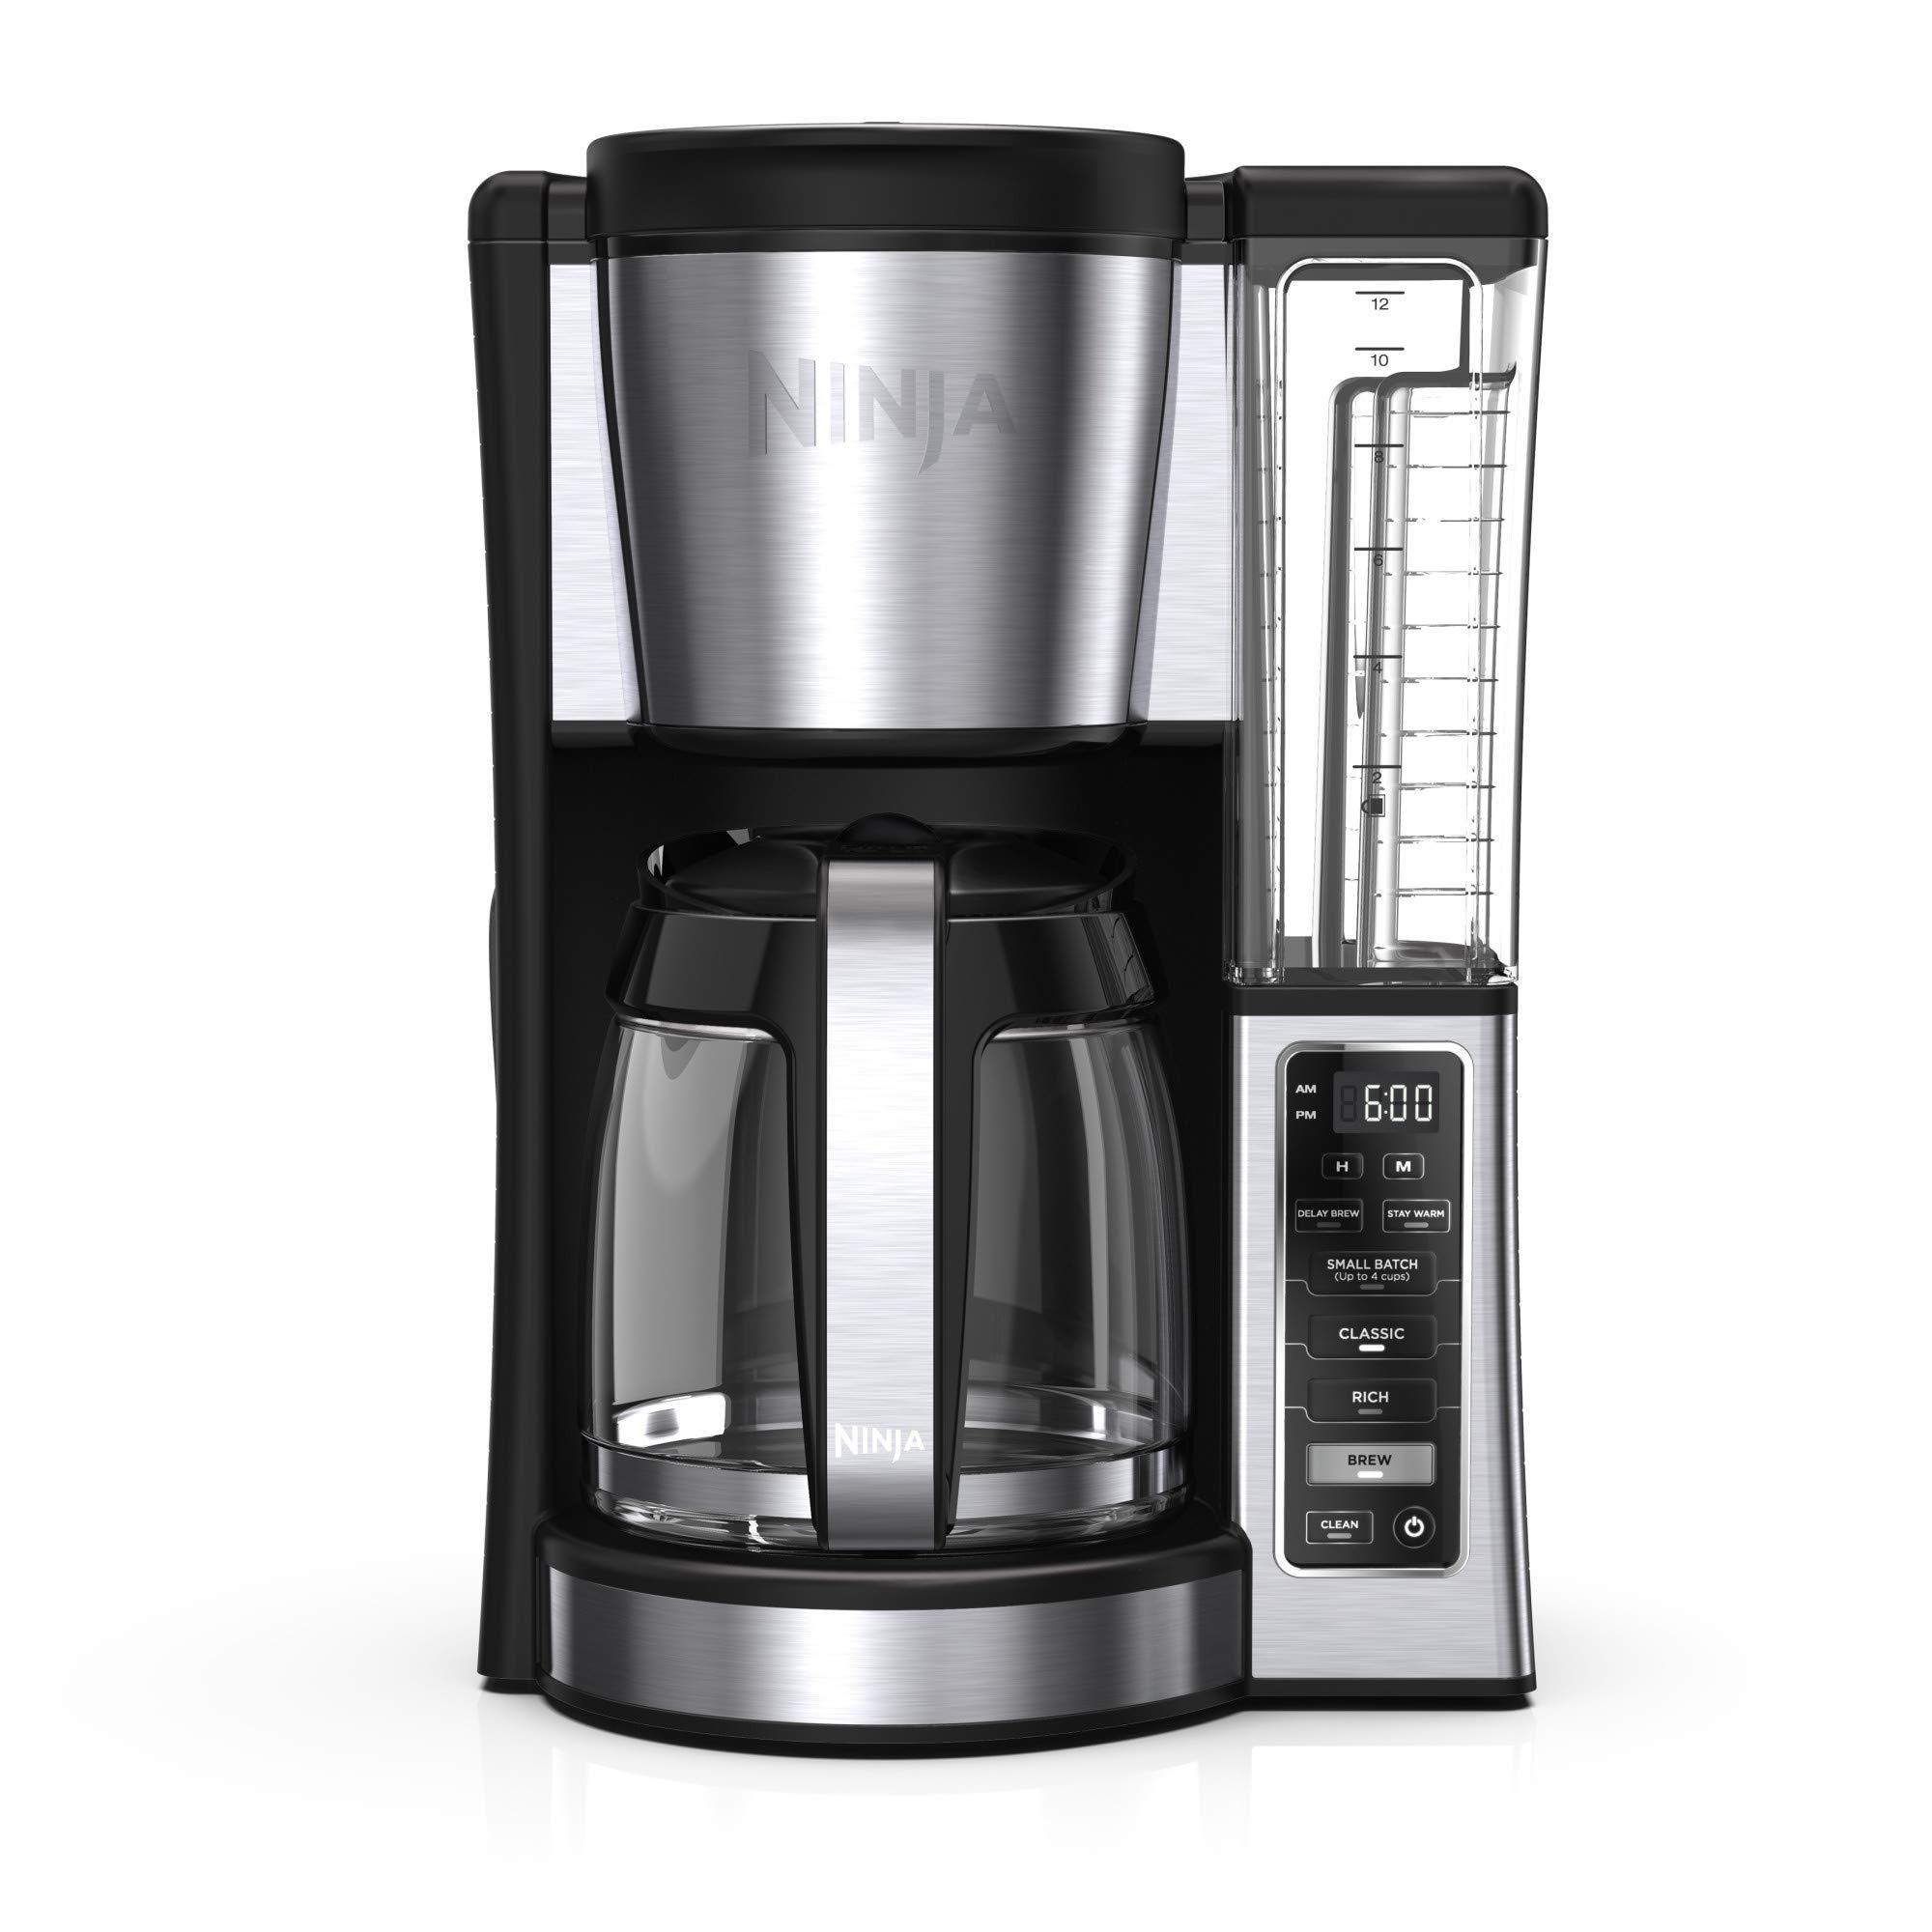 Ninja 12-Cup Programmable Brewer CE251 Coffee Maker, 60 oz, Black/Stainless Steel by Ninja